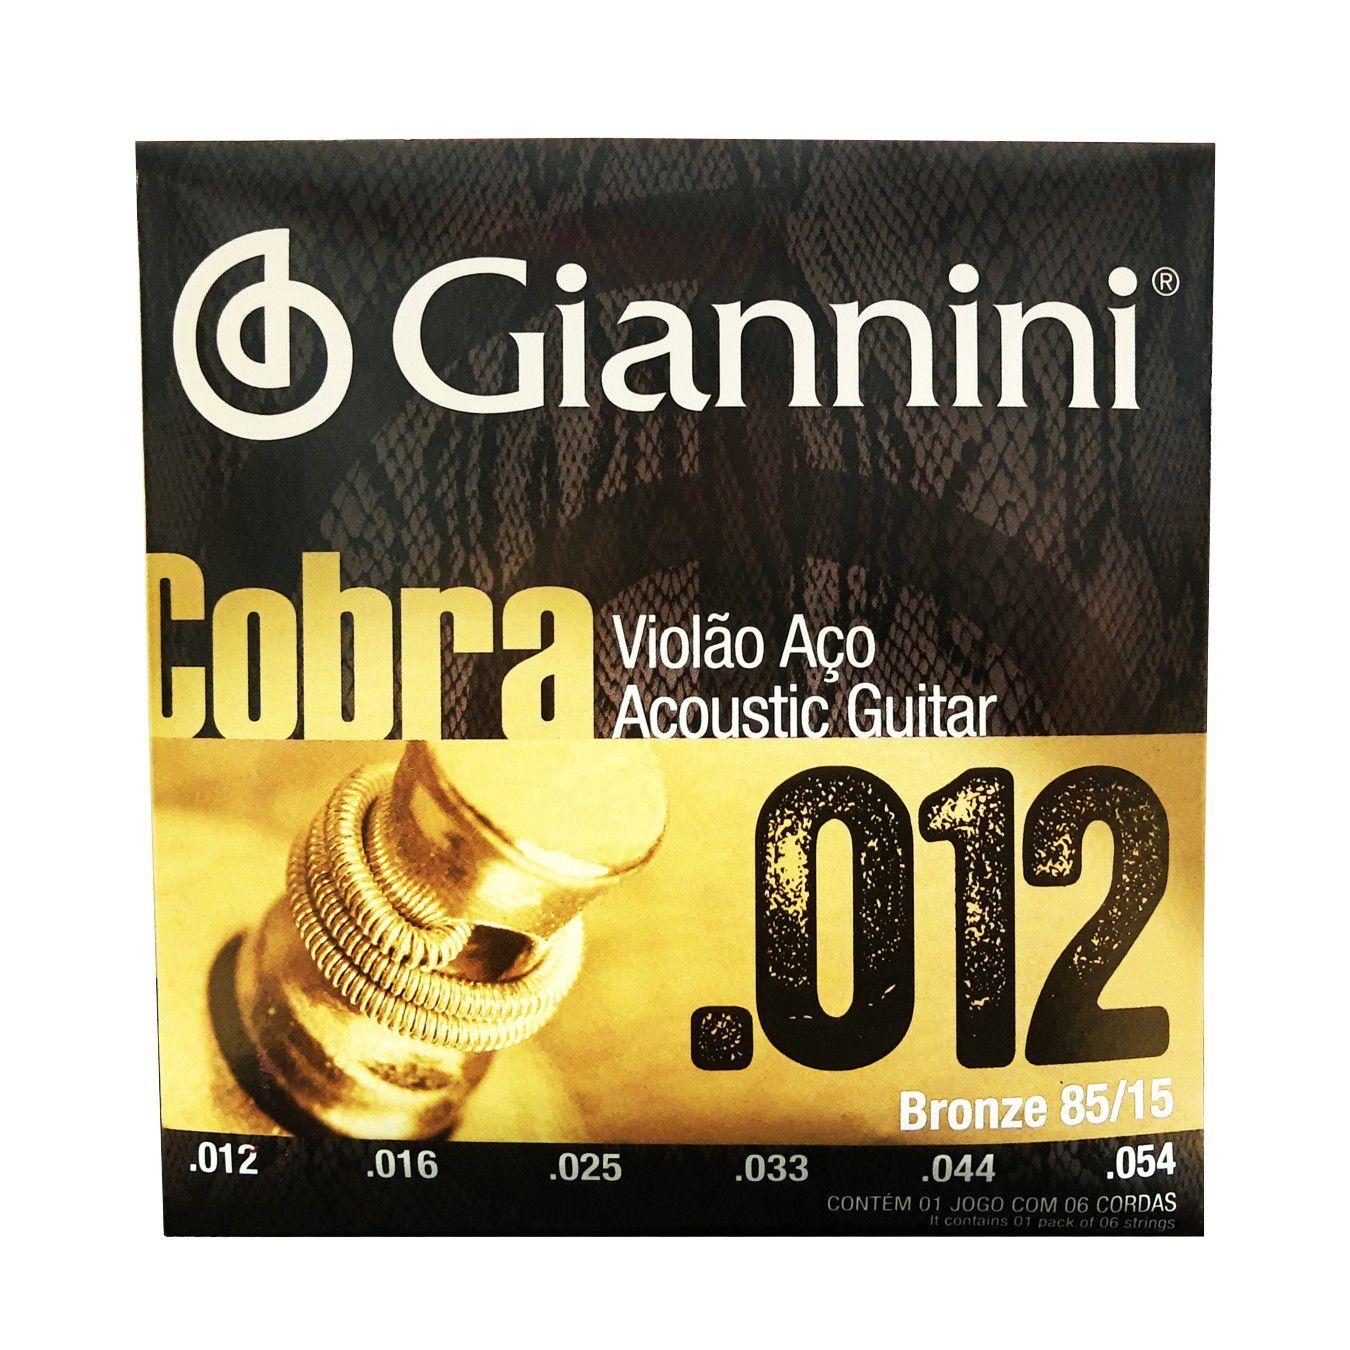 Encordoamento Violao Aco Giannini Cobra Geeflks 0.12